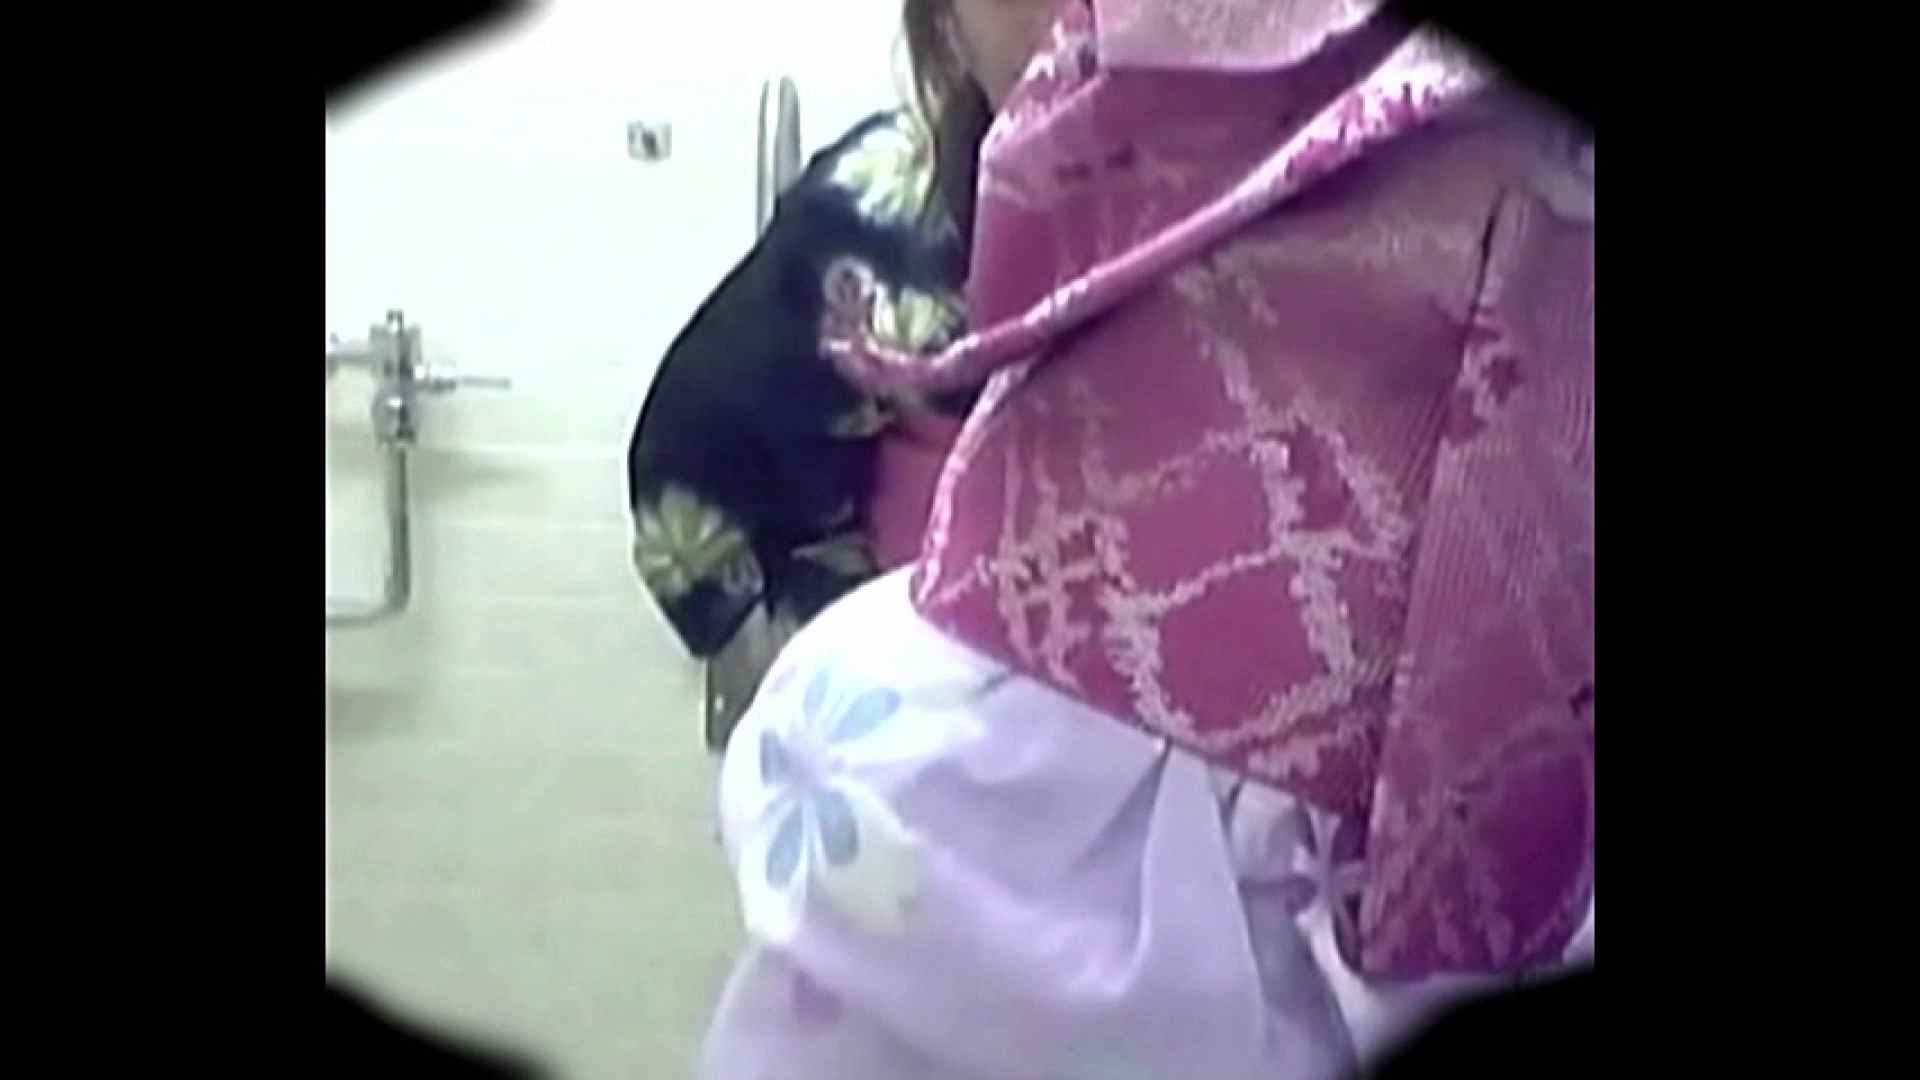 teen galトイレ覗き紙がナイ編‼vol.01 覗き 盗撮画像 76PIX 74